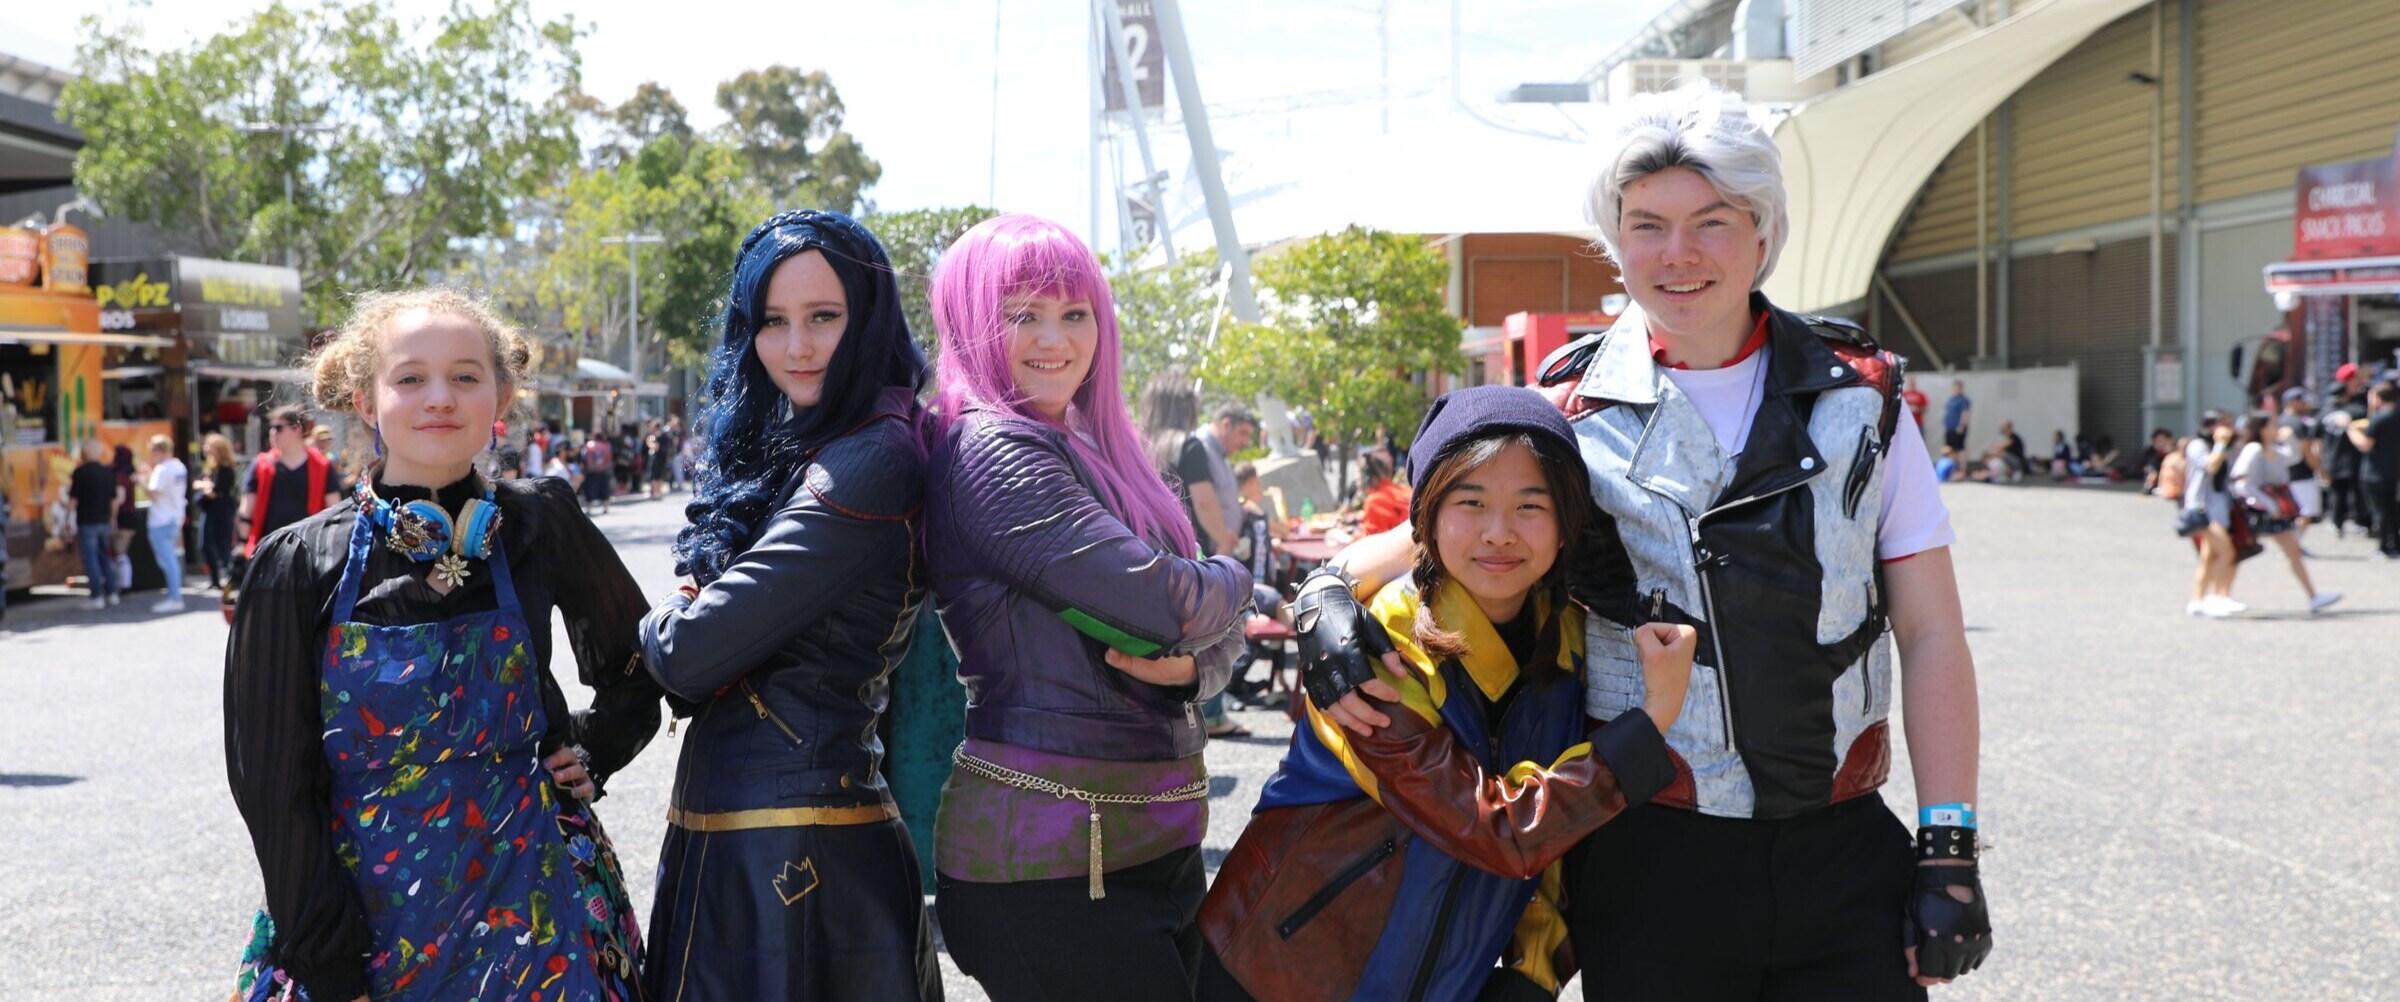 Oz Comic-Con Sydney 2019 | Costume Wrap | Article Page Hero